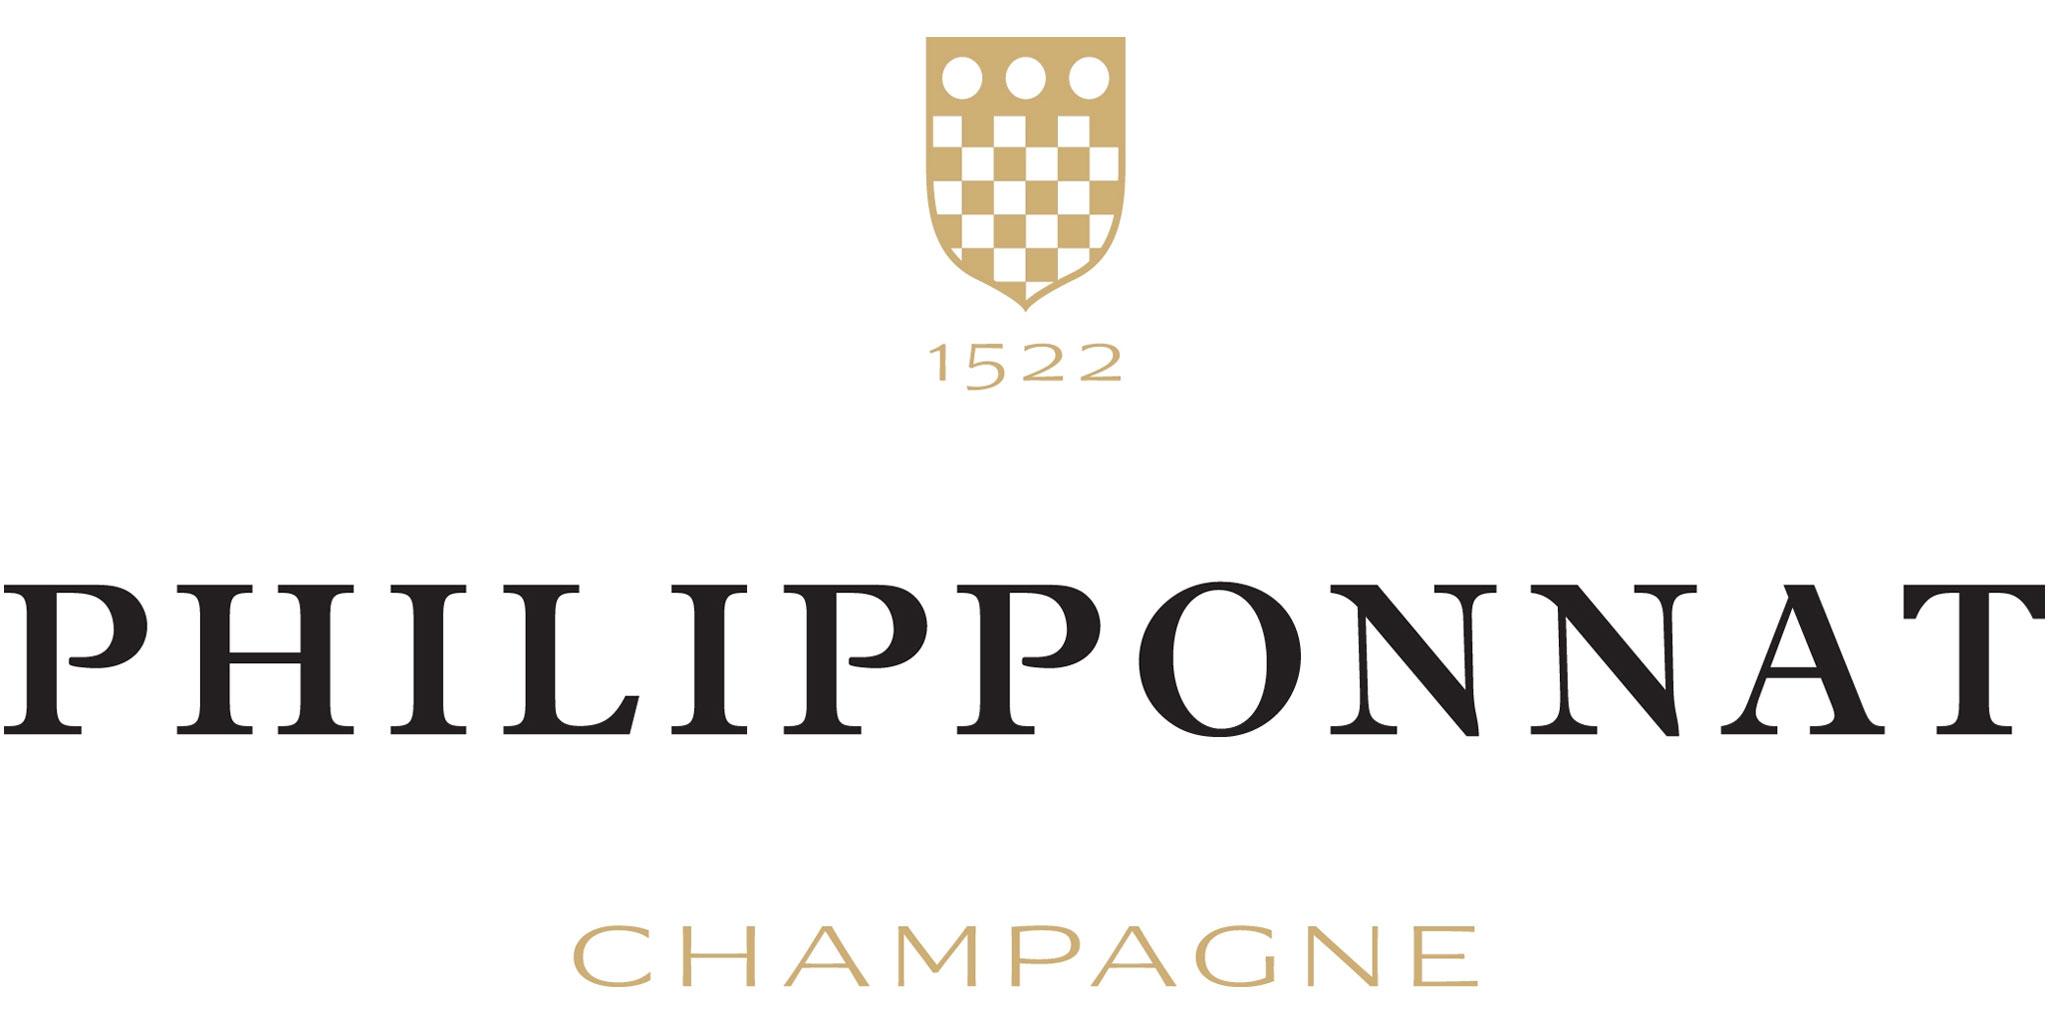 Philipponnat champagne logo